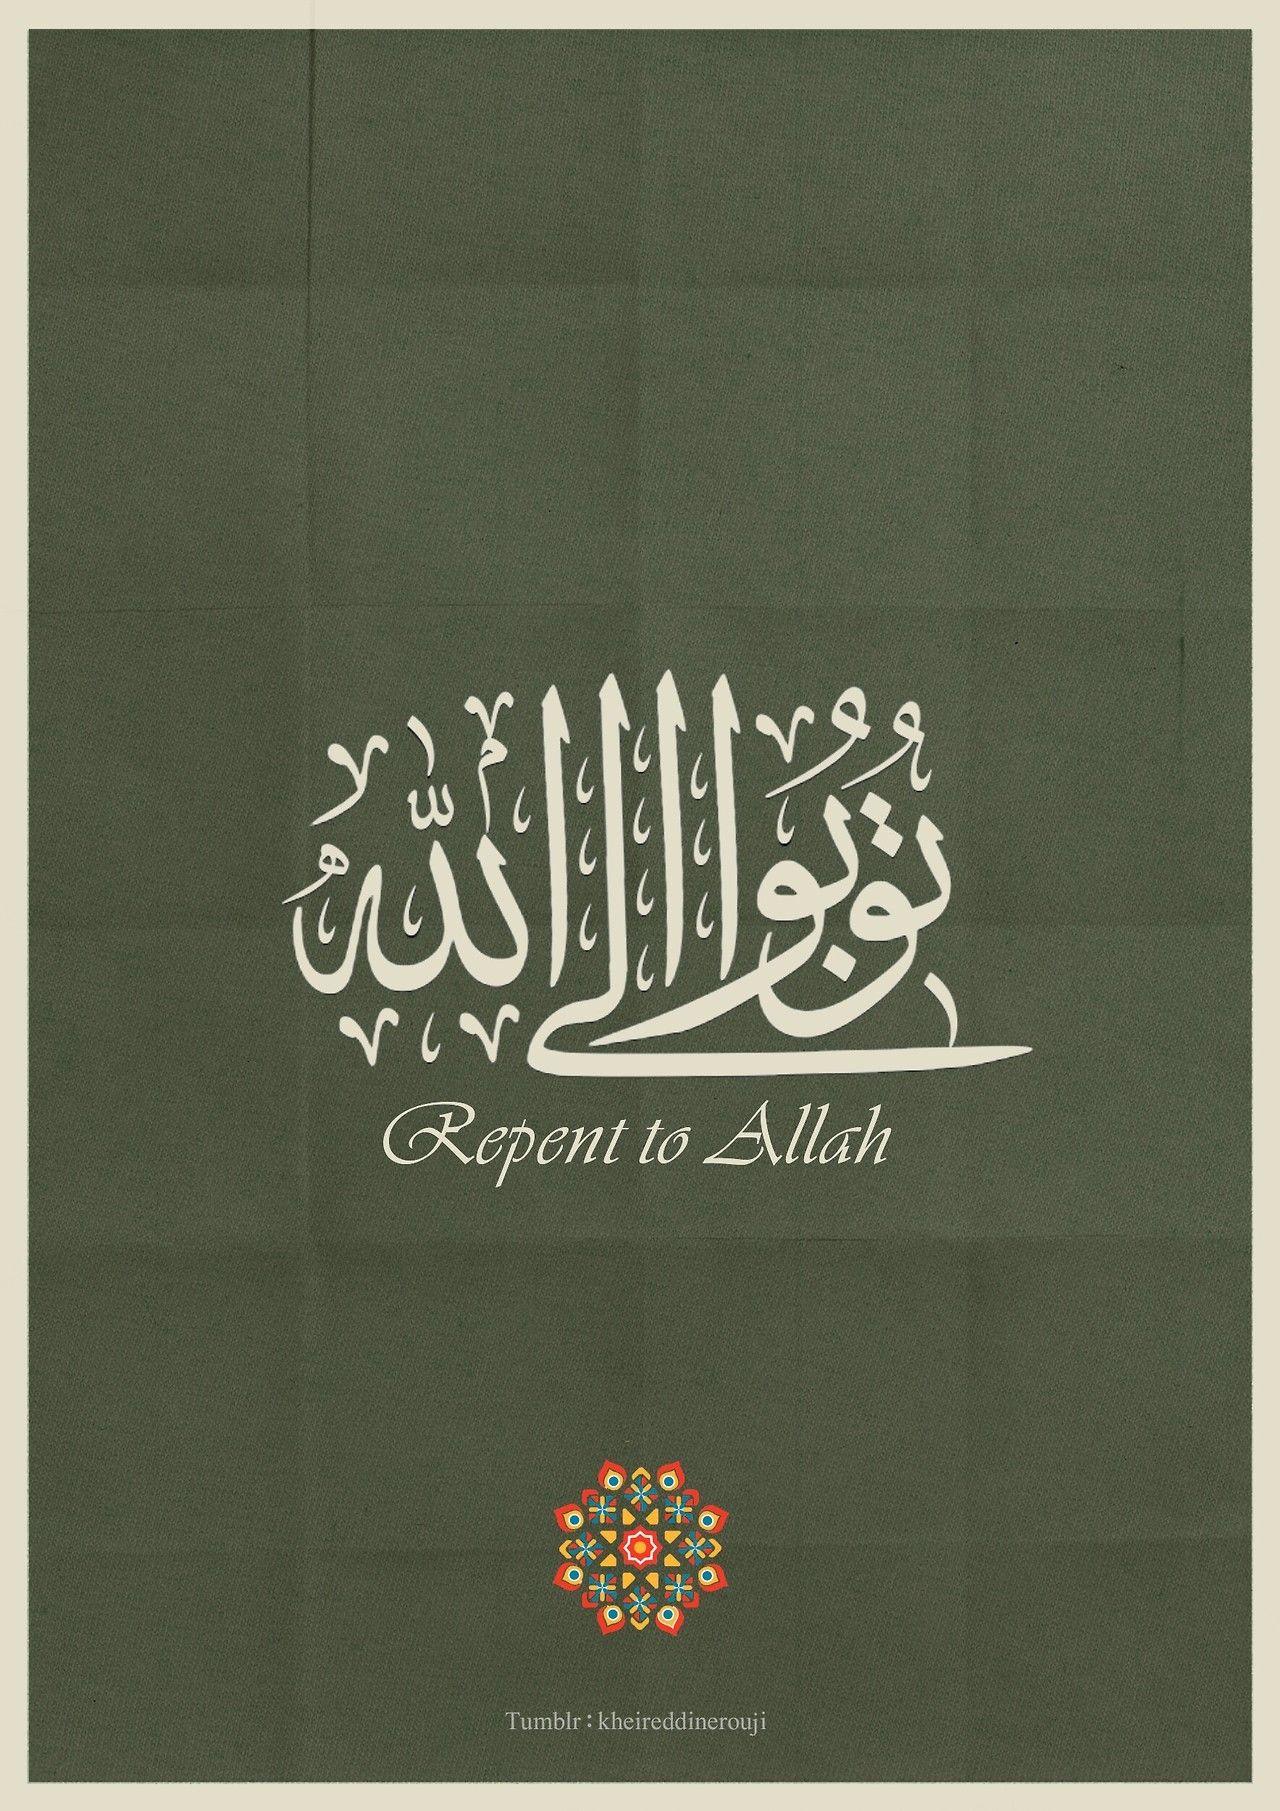 توبوا الى الله Hindi Quotes Special Words Arabic Quotes